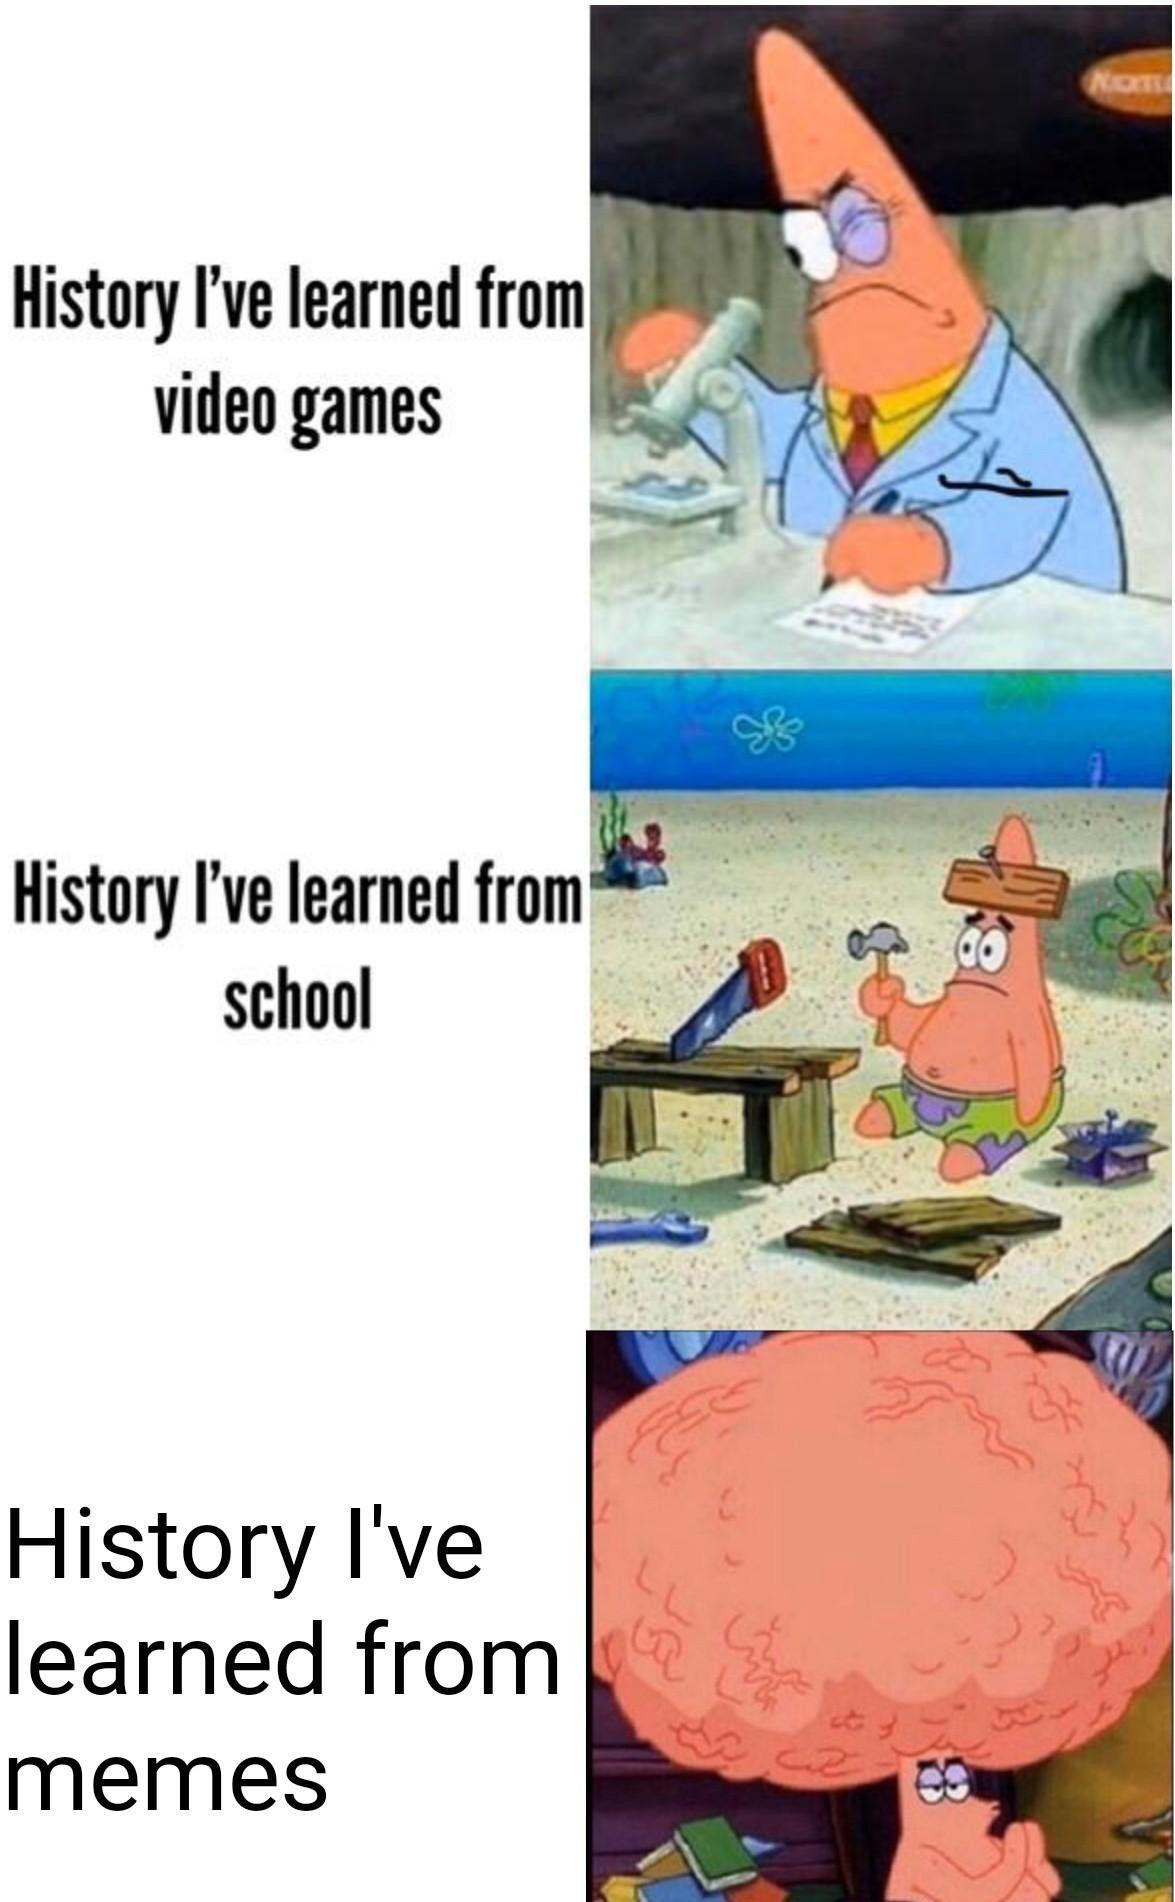 Spongebob Airpod Meme : spongebob, airpod, MEMES, PrO_RaZe